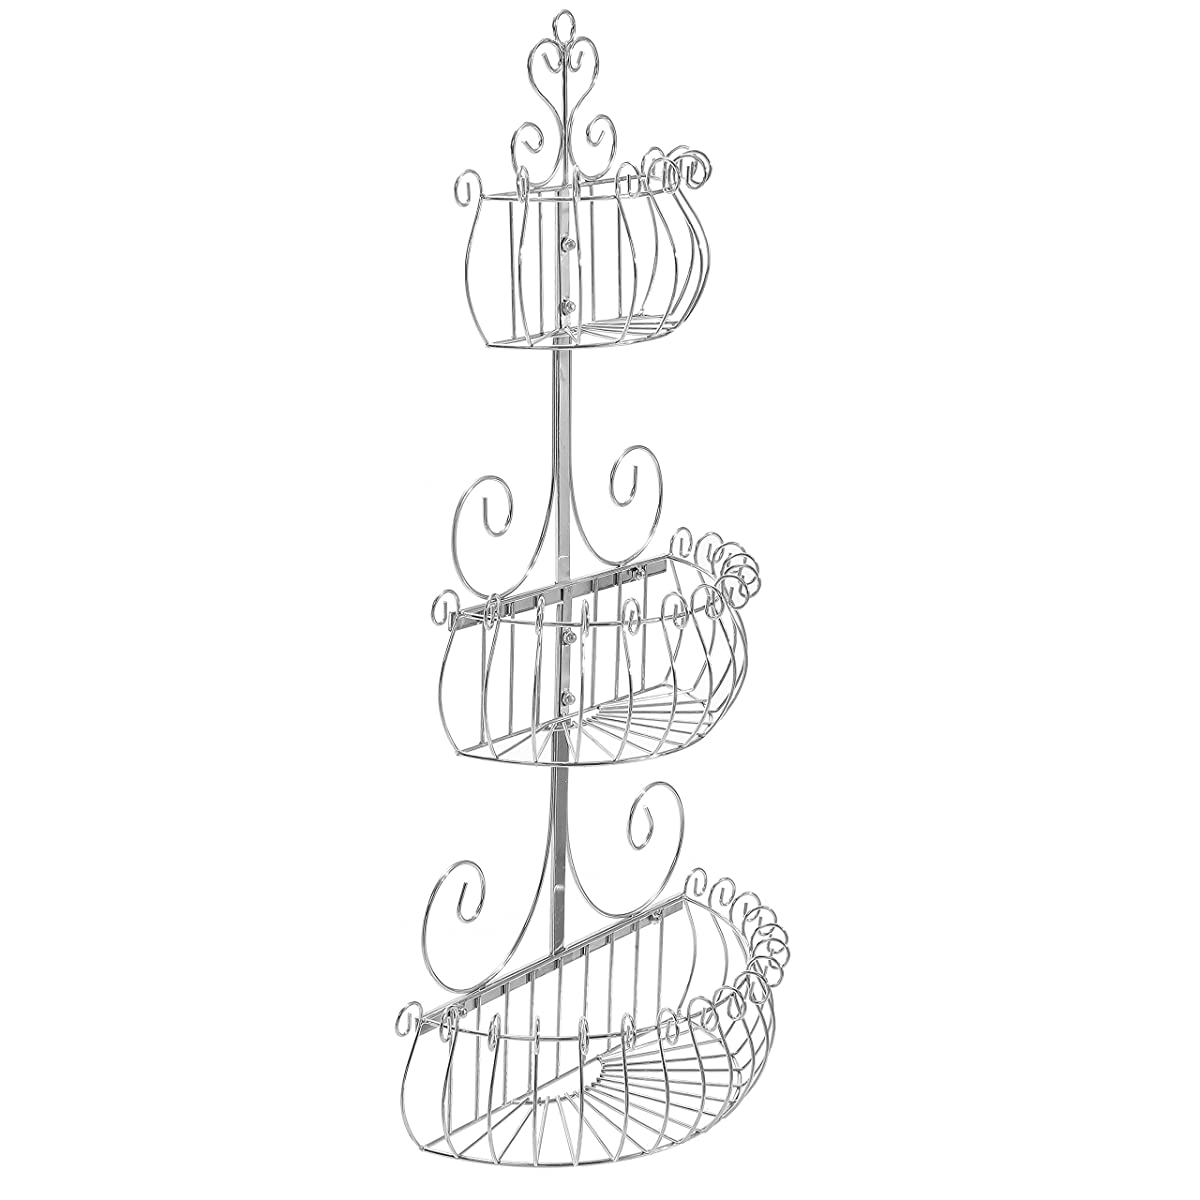 Wall Mounted Scrollwork Design Deluxe 3 Tier Silver Iron Fruit Basket / Kitchen Storage Rack - MyGift